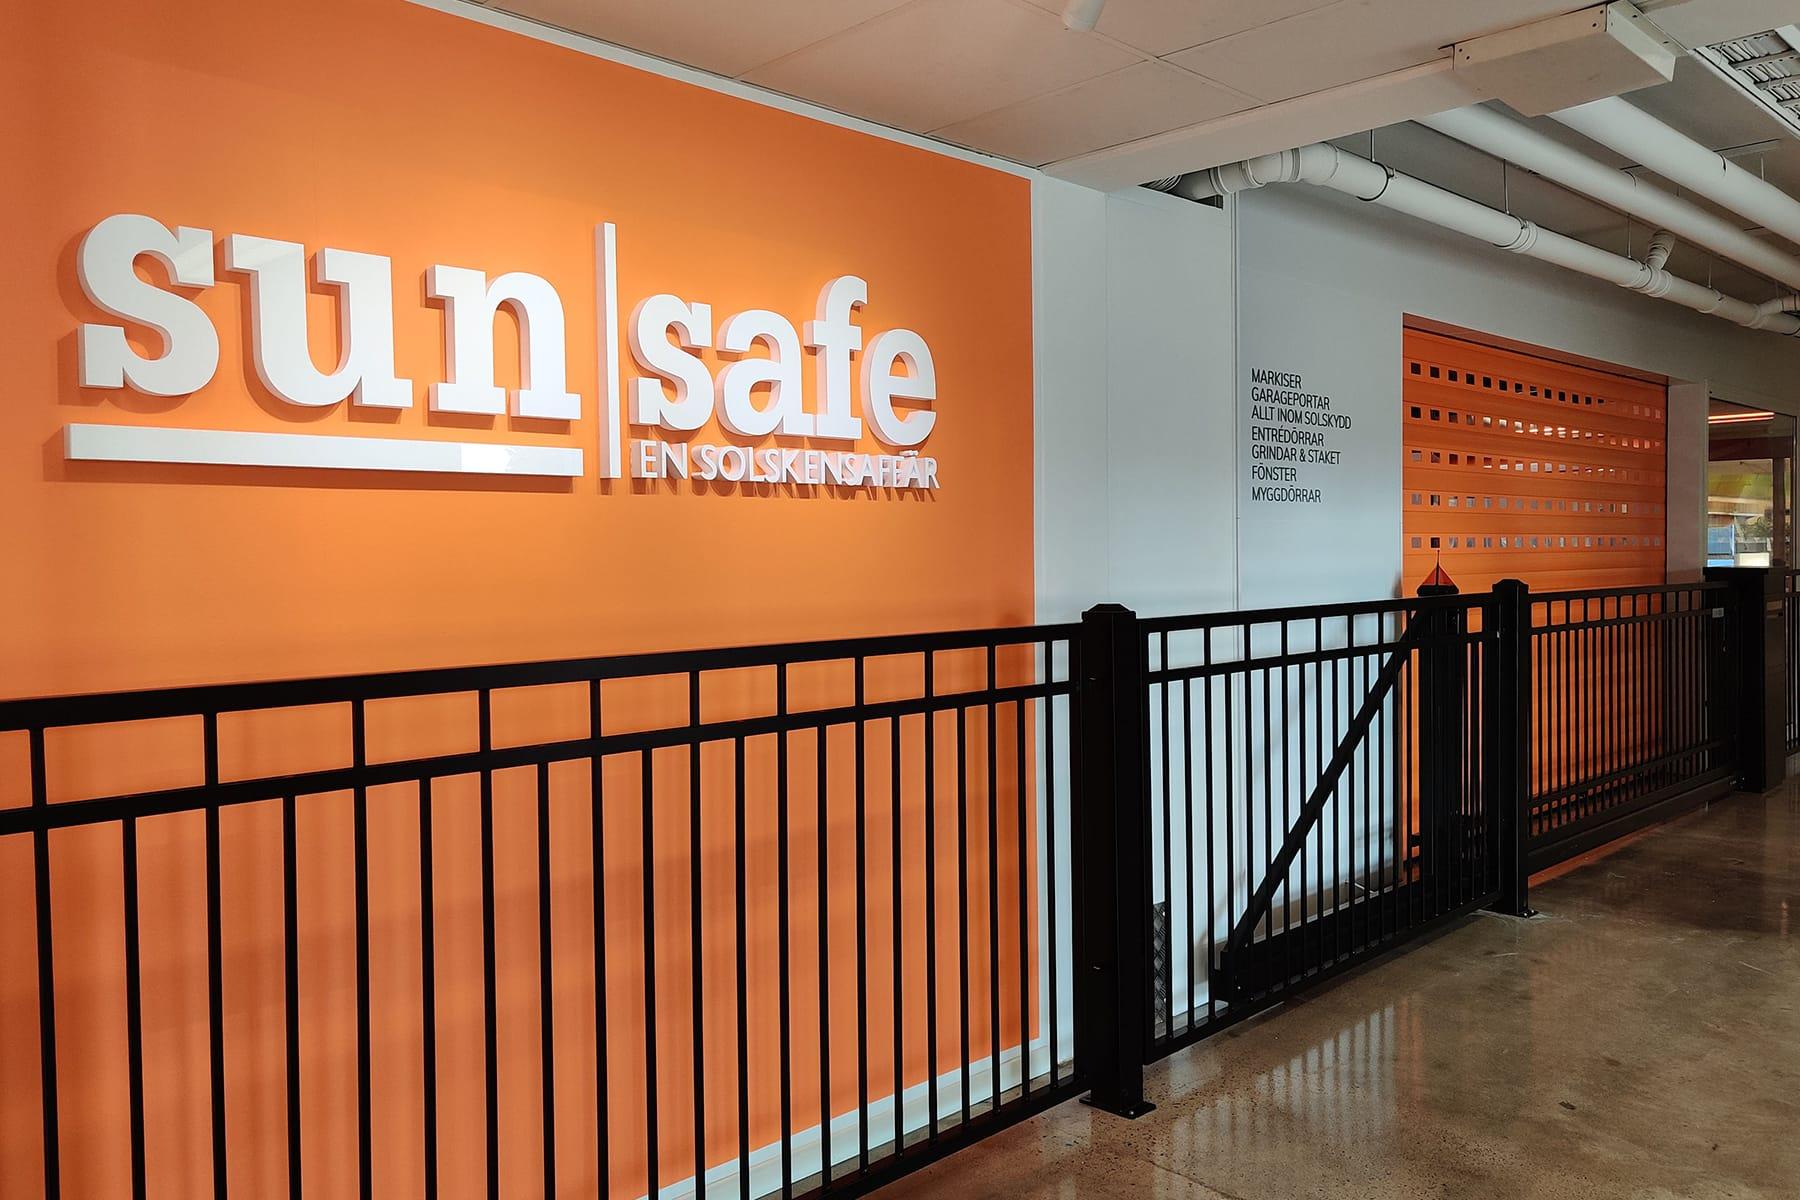 Sunsafe designbutik öppnades Augusti 20 2020